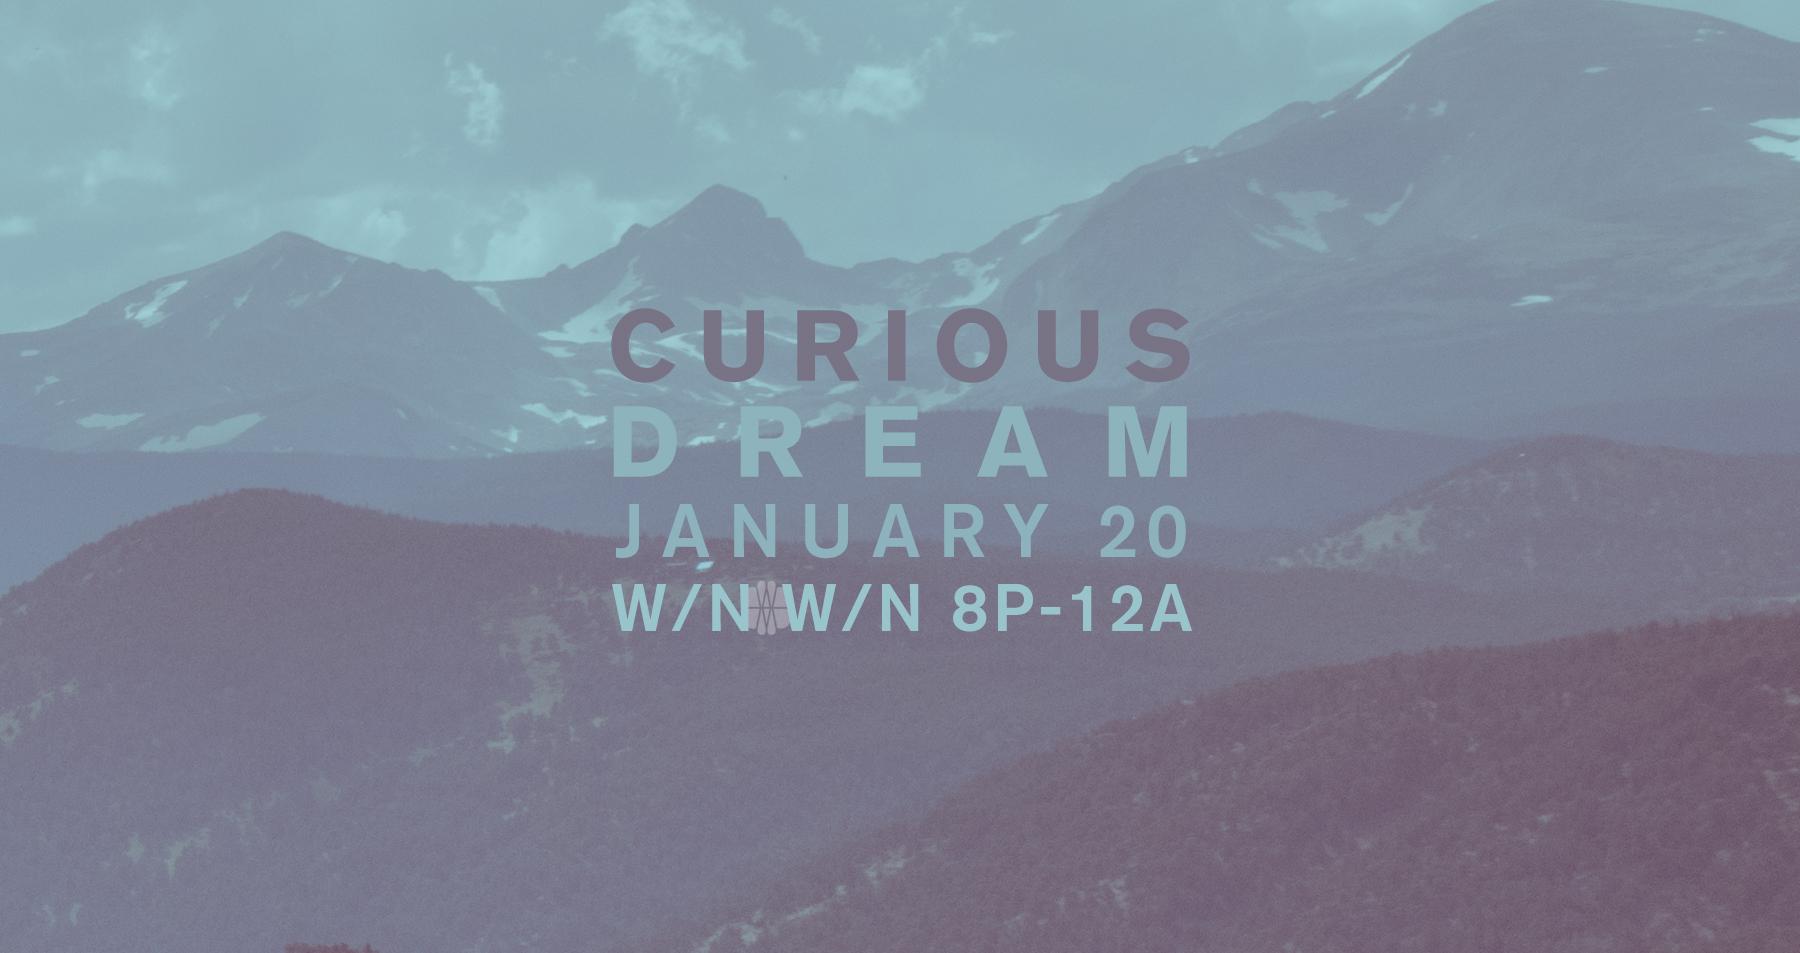 CuriousDream_JAN20_2019.jpg